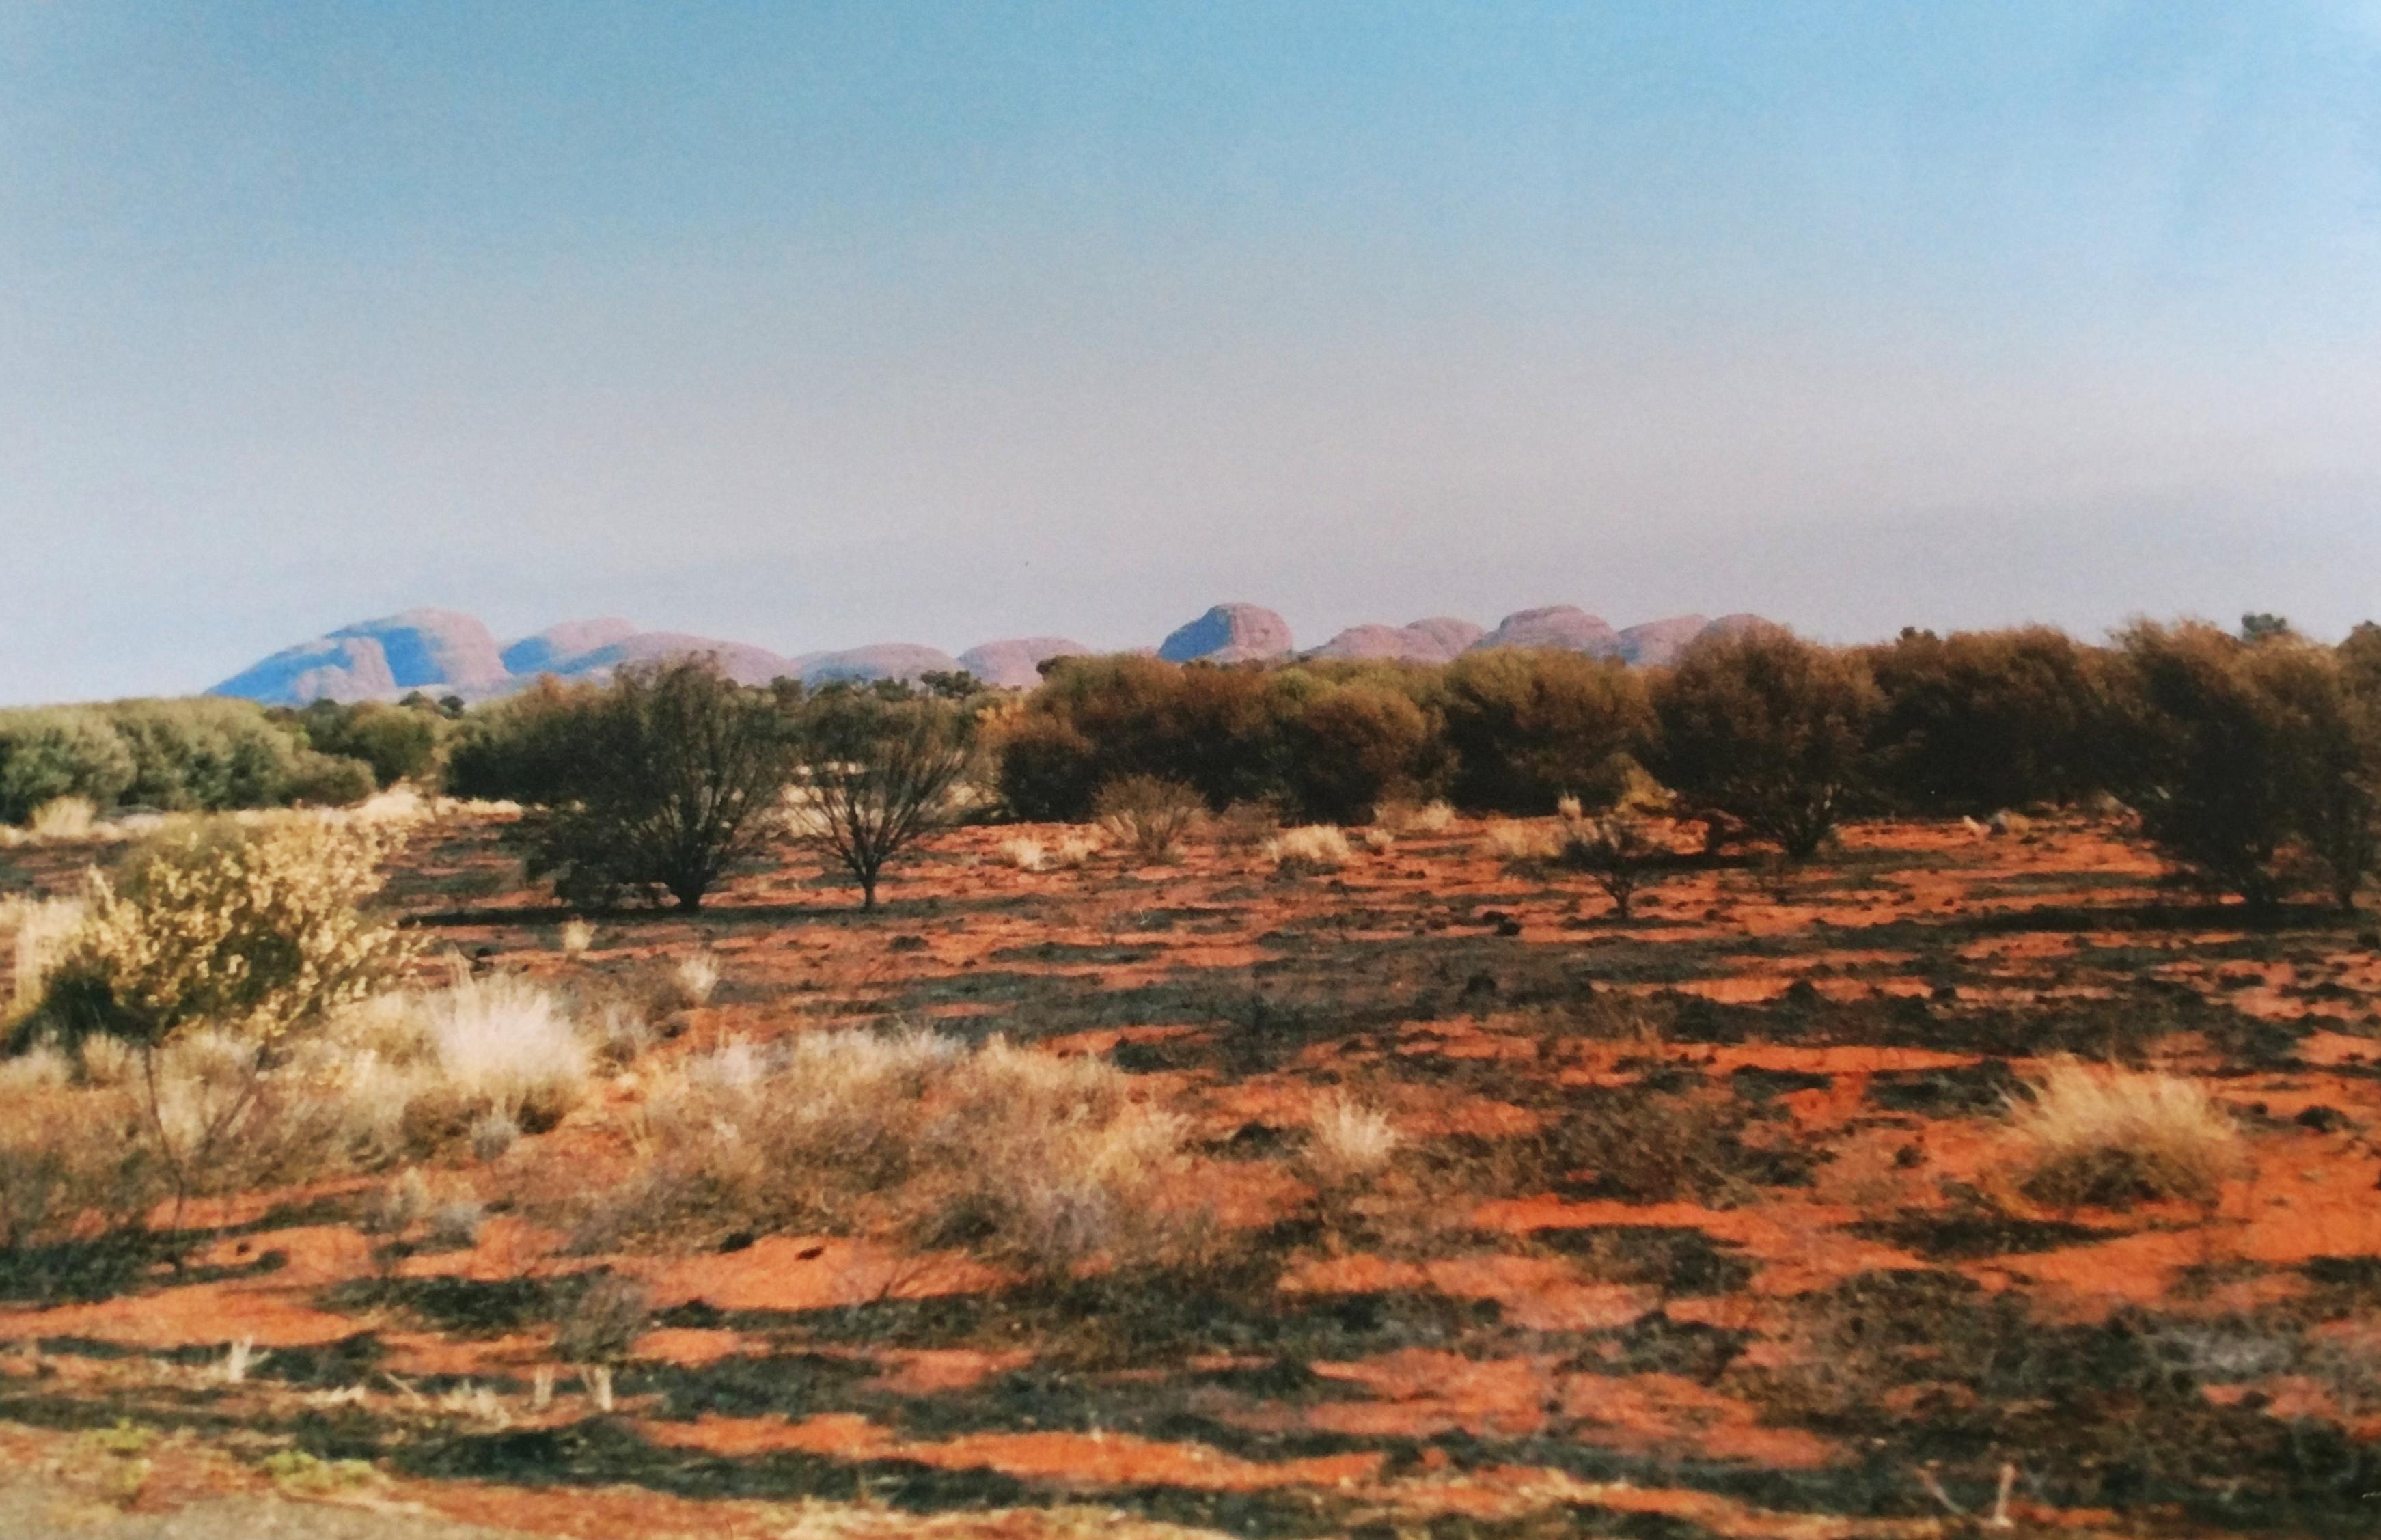 Uluru 4. Monica Soto Icaza